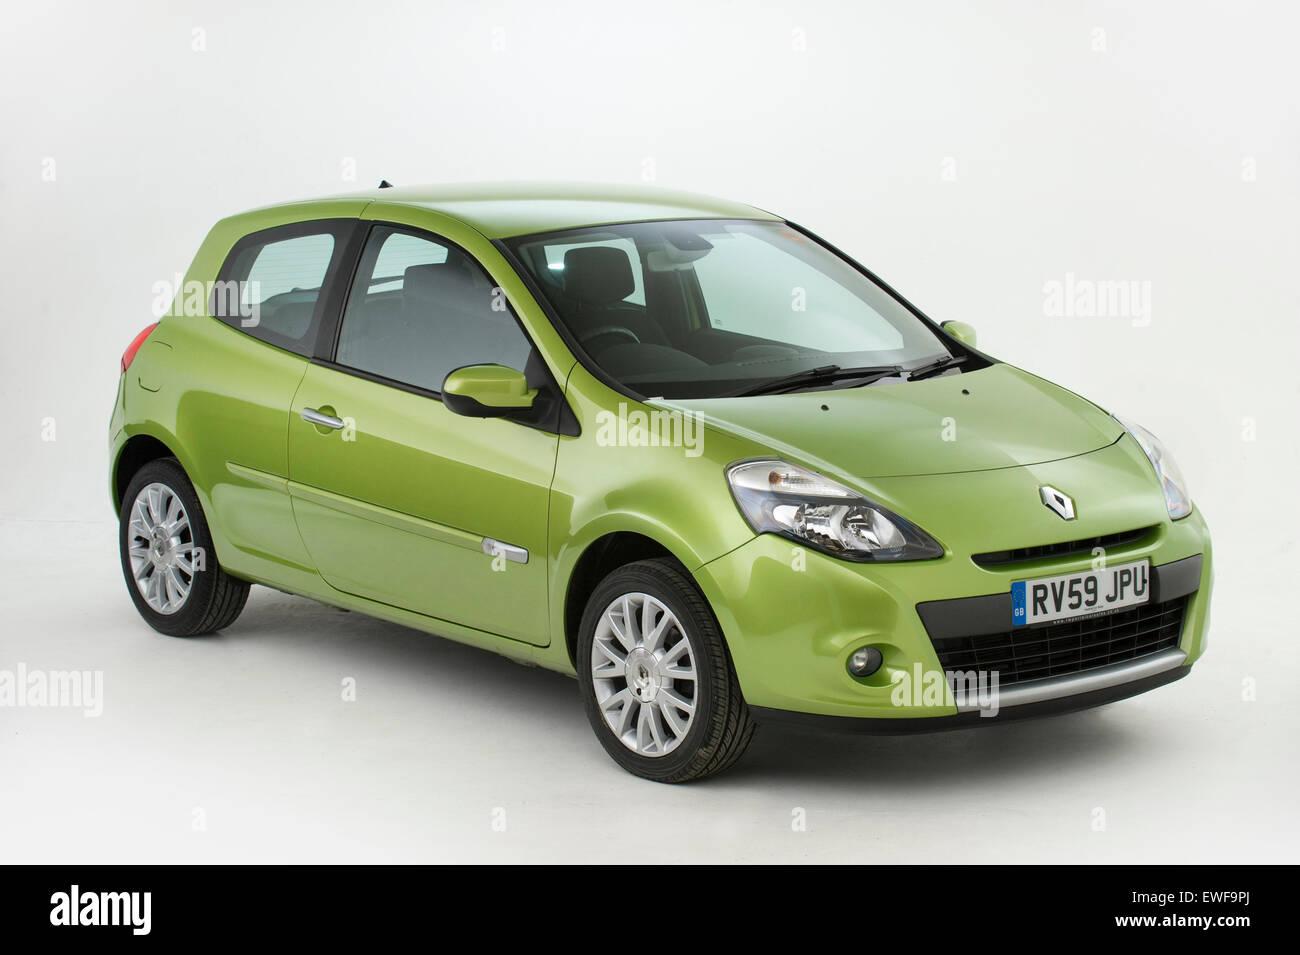 2009 Renault Clio - Stock Image